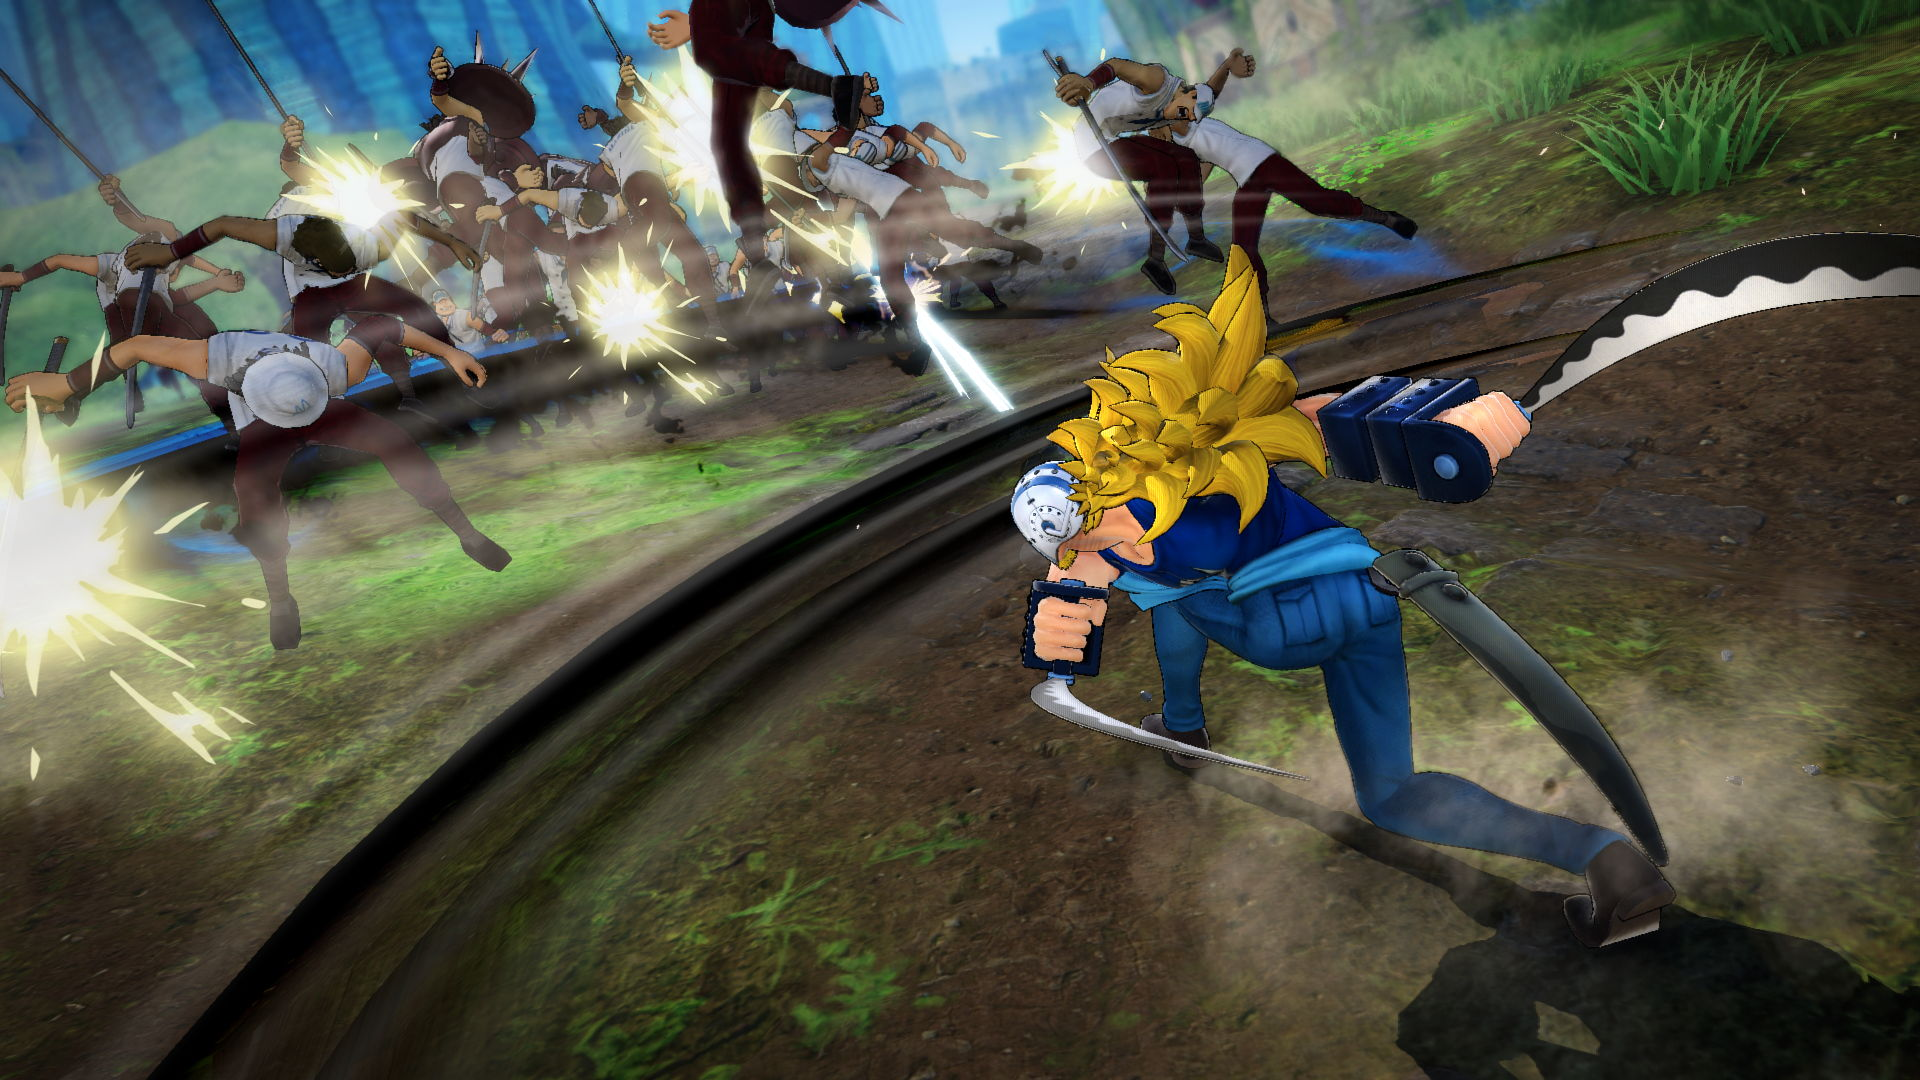 BANDAI NAMCO Entertainment America Inc. presentó el primer video de gameplay de Killer, que atravesará los campos de batalla de ONE PIECE: PIRATE WARRIORS 4